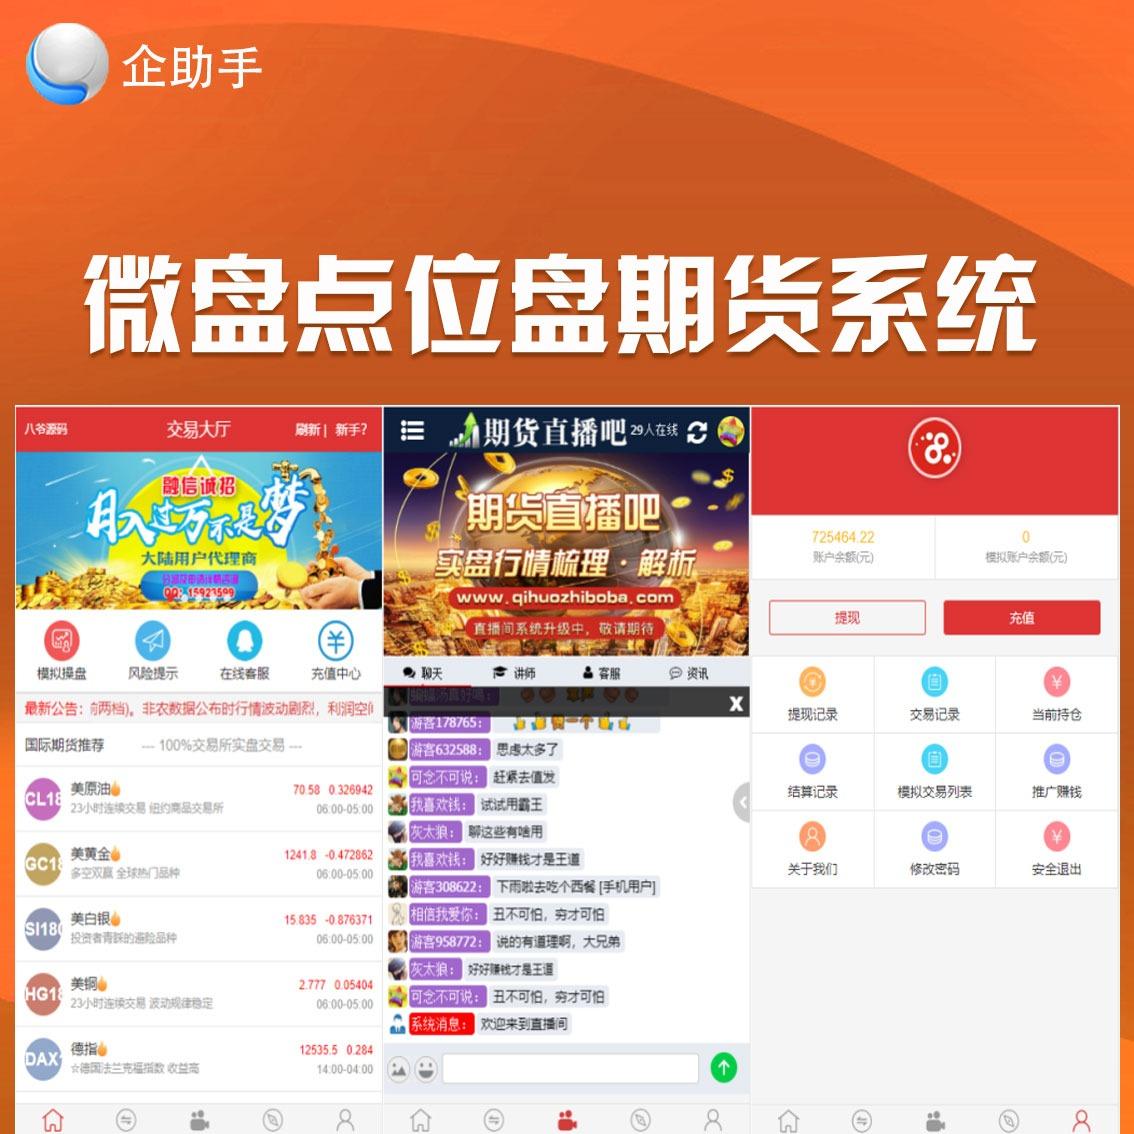 D2-2微交易富盈国际微盘点位盘yii国内国外期货盘带直播